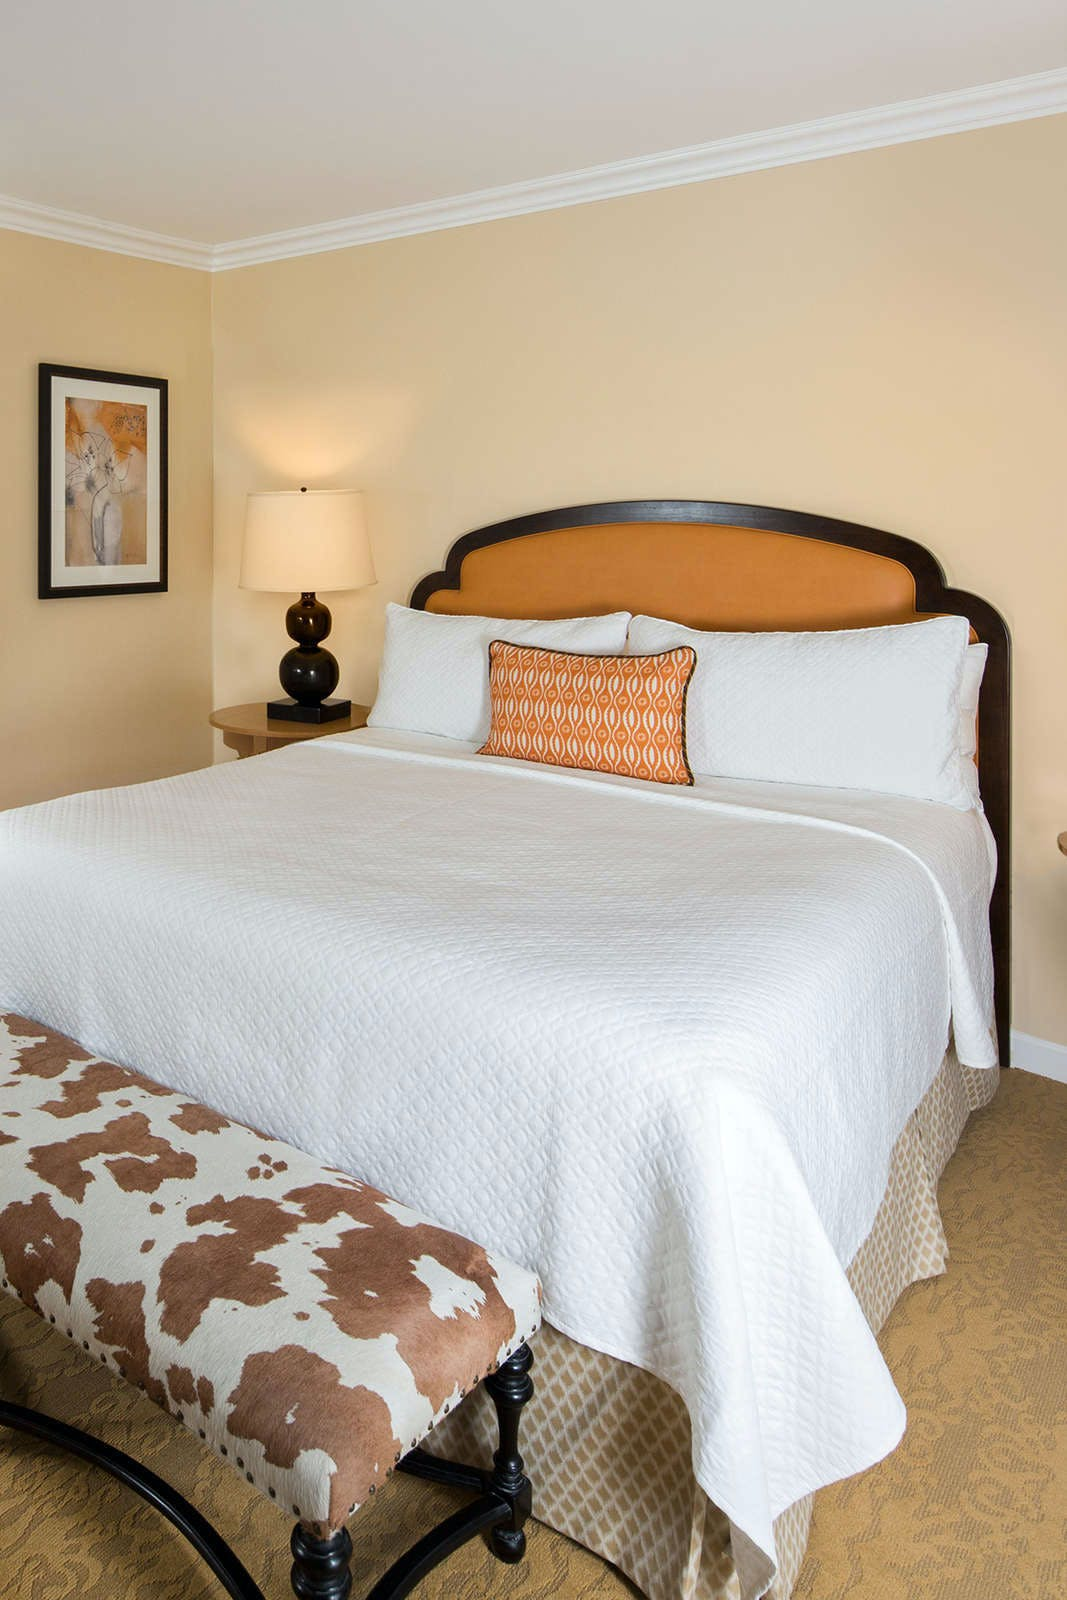 Estancia La Jolla Hotel & Spa